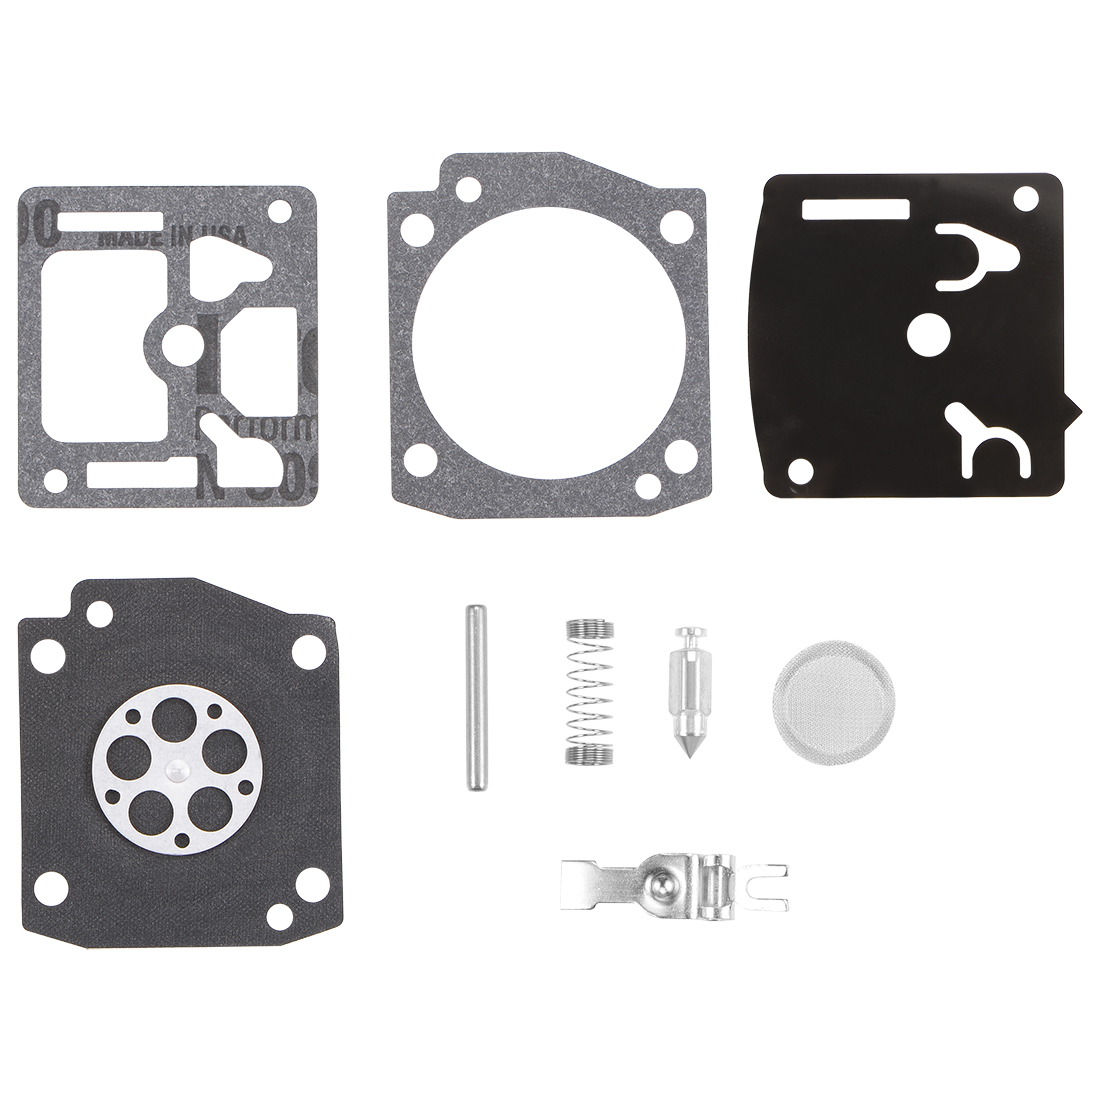 MS361 Carburetor Rebuild Kit Gasket Diaphragm for K10-HD Carburetor Carb 2pcs